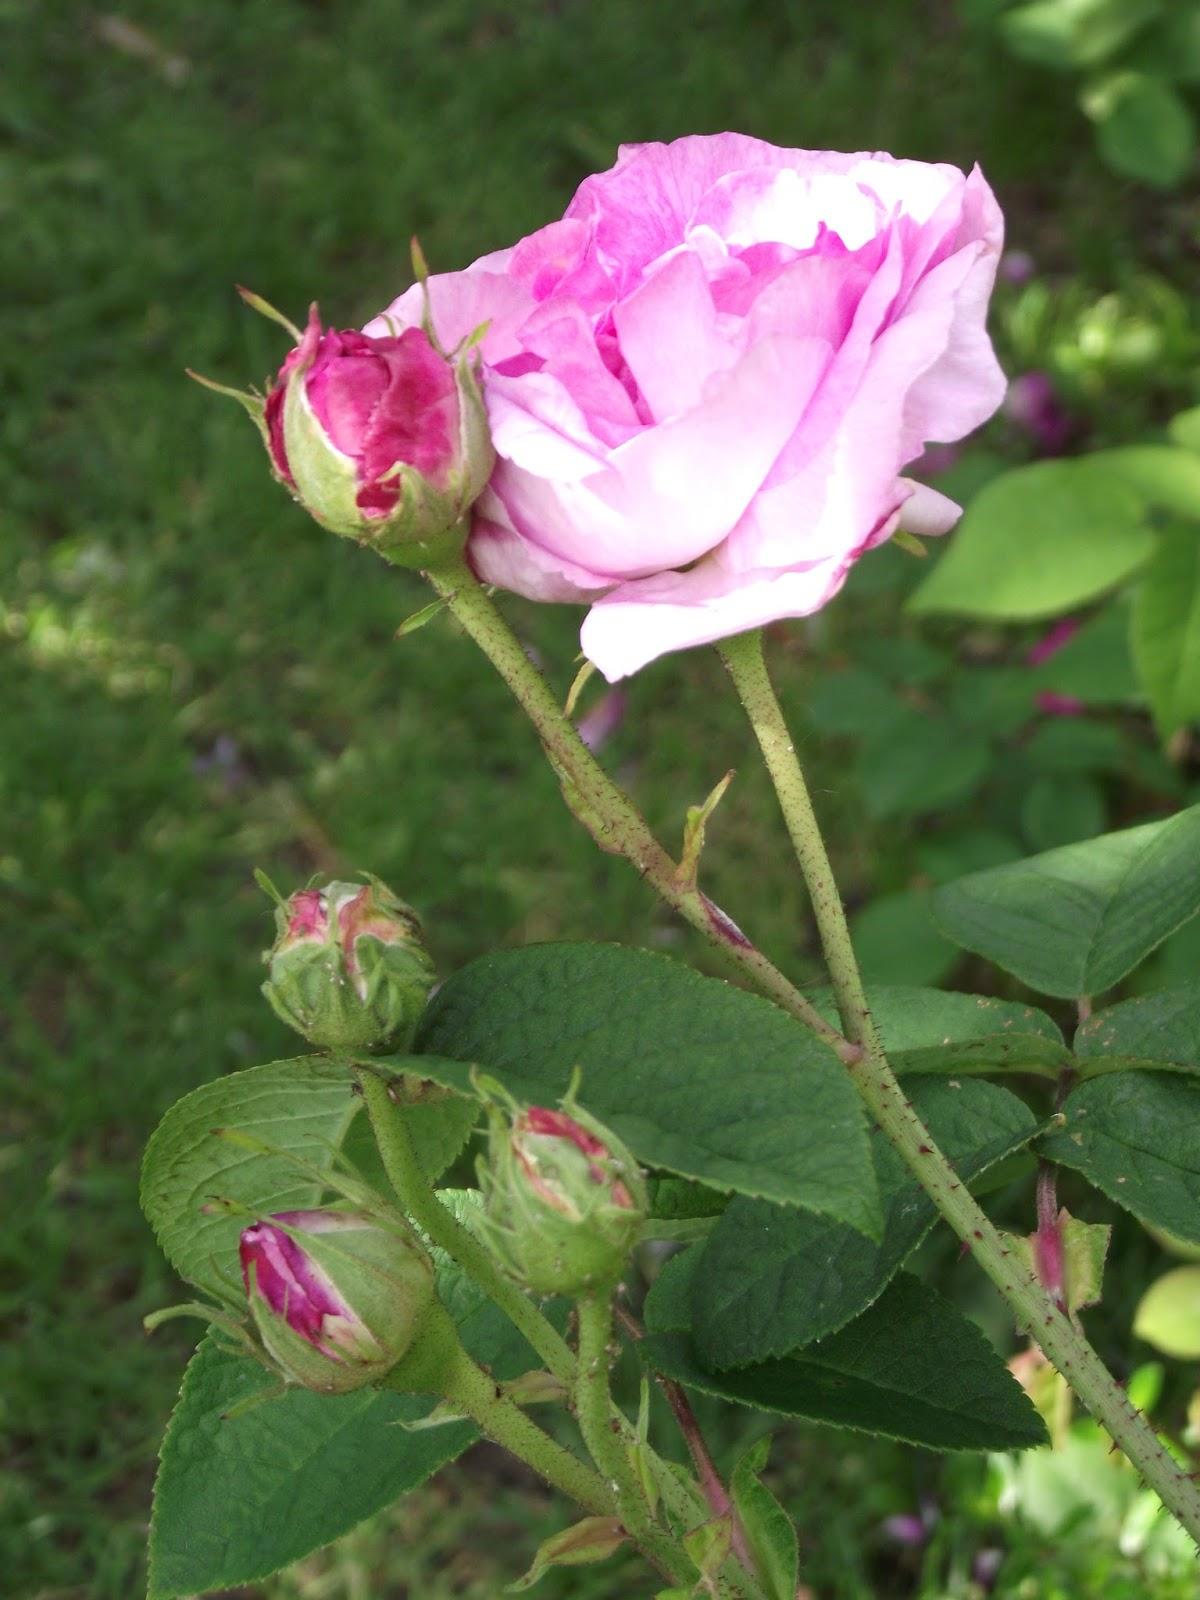 promesse de roses rose de la ma tre ecole. Black Bedroom Furniture Sets. Home Design Ideas